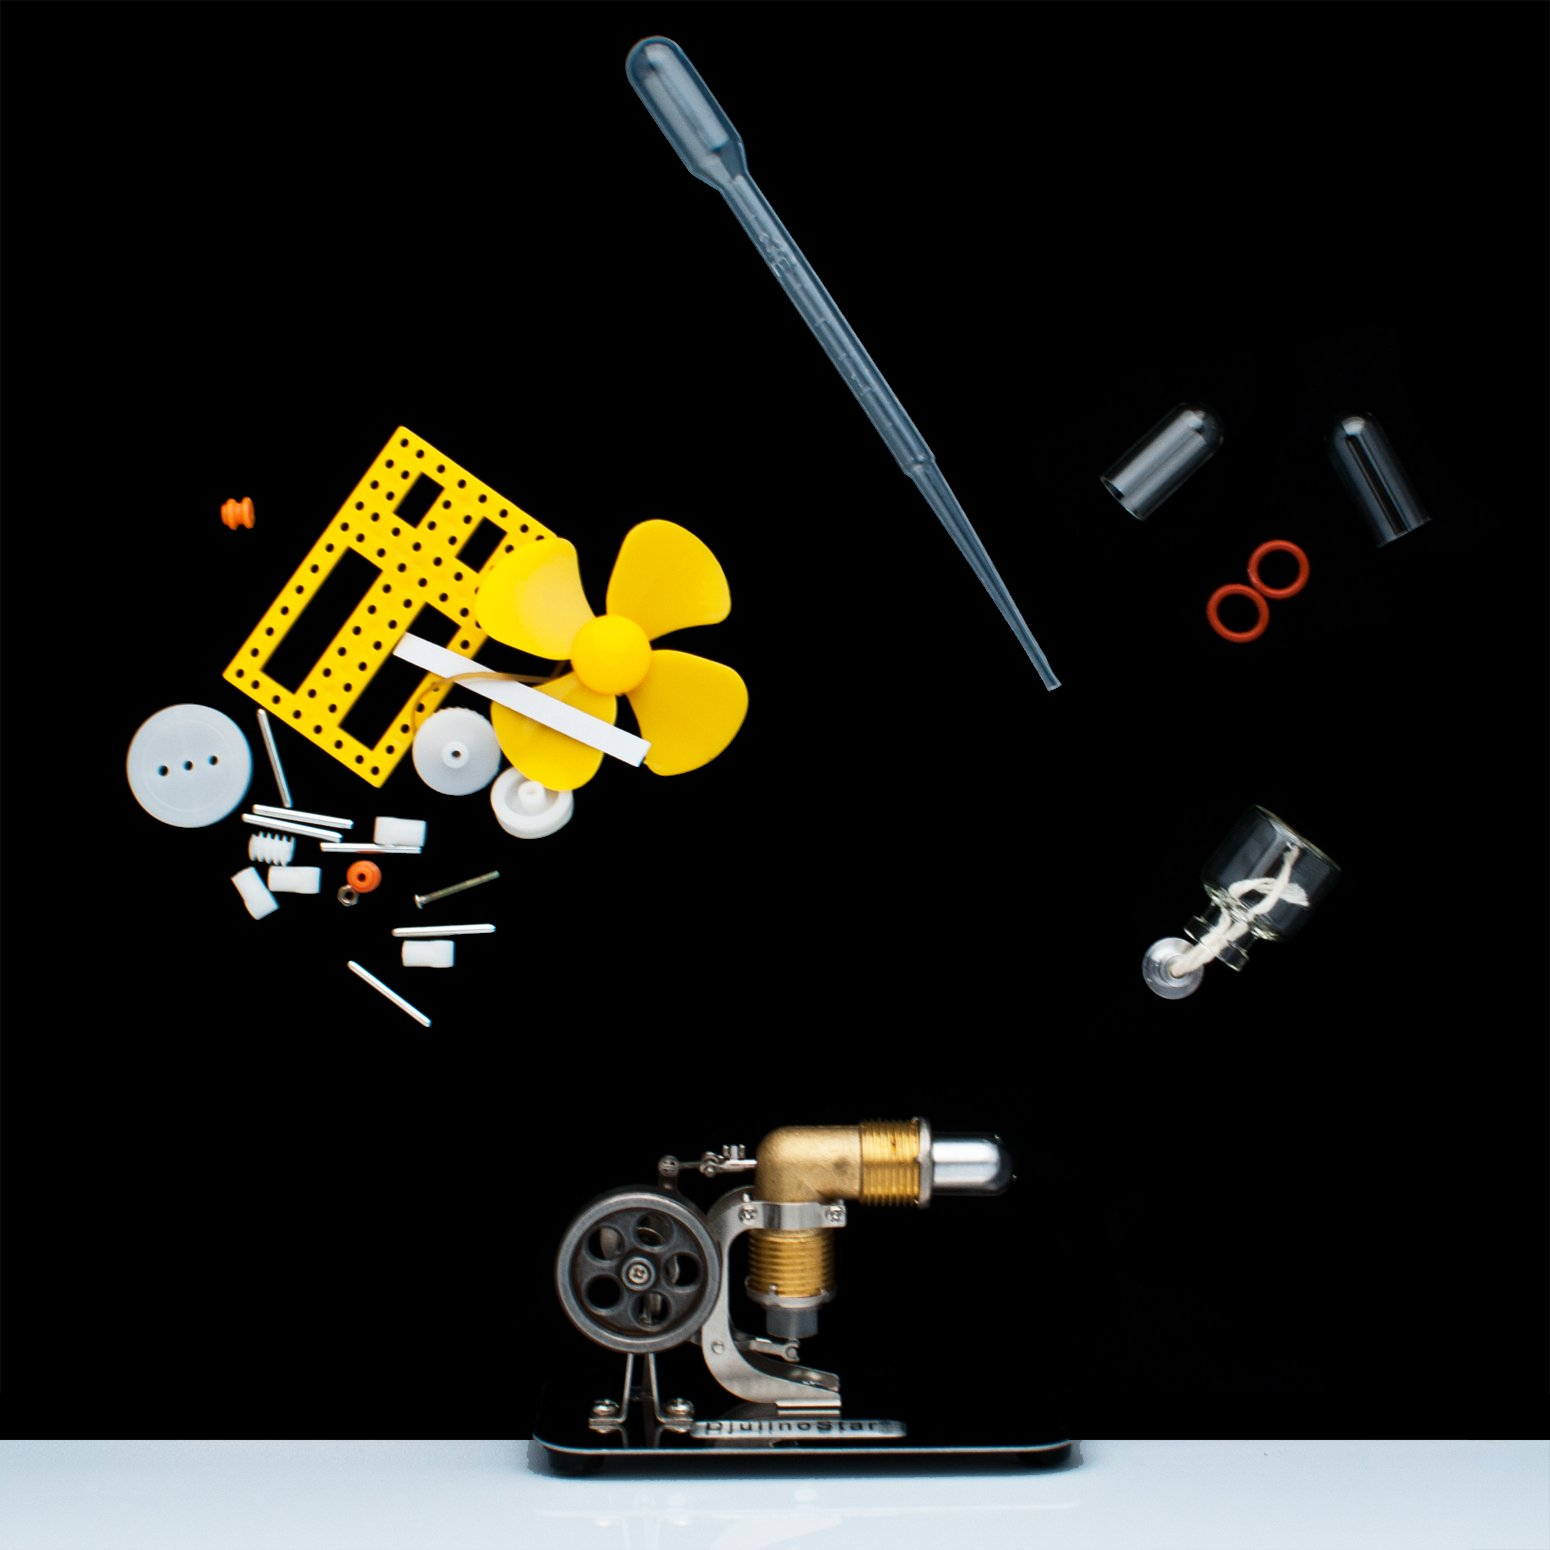 DjuiinoStar Mini Hot Air Stirling Engine: A High Performance Pocket-Sized Working Model by DjuiinoStar (Image #7)